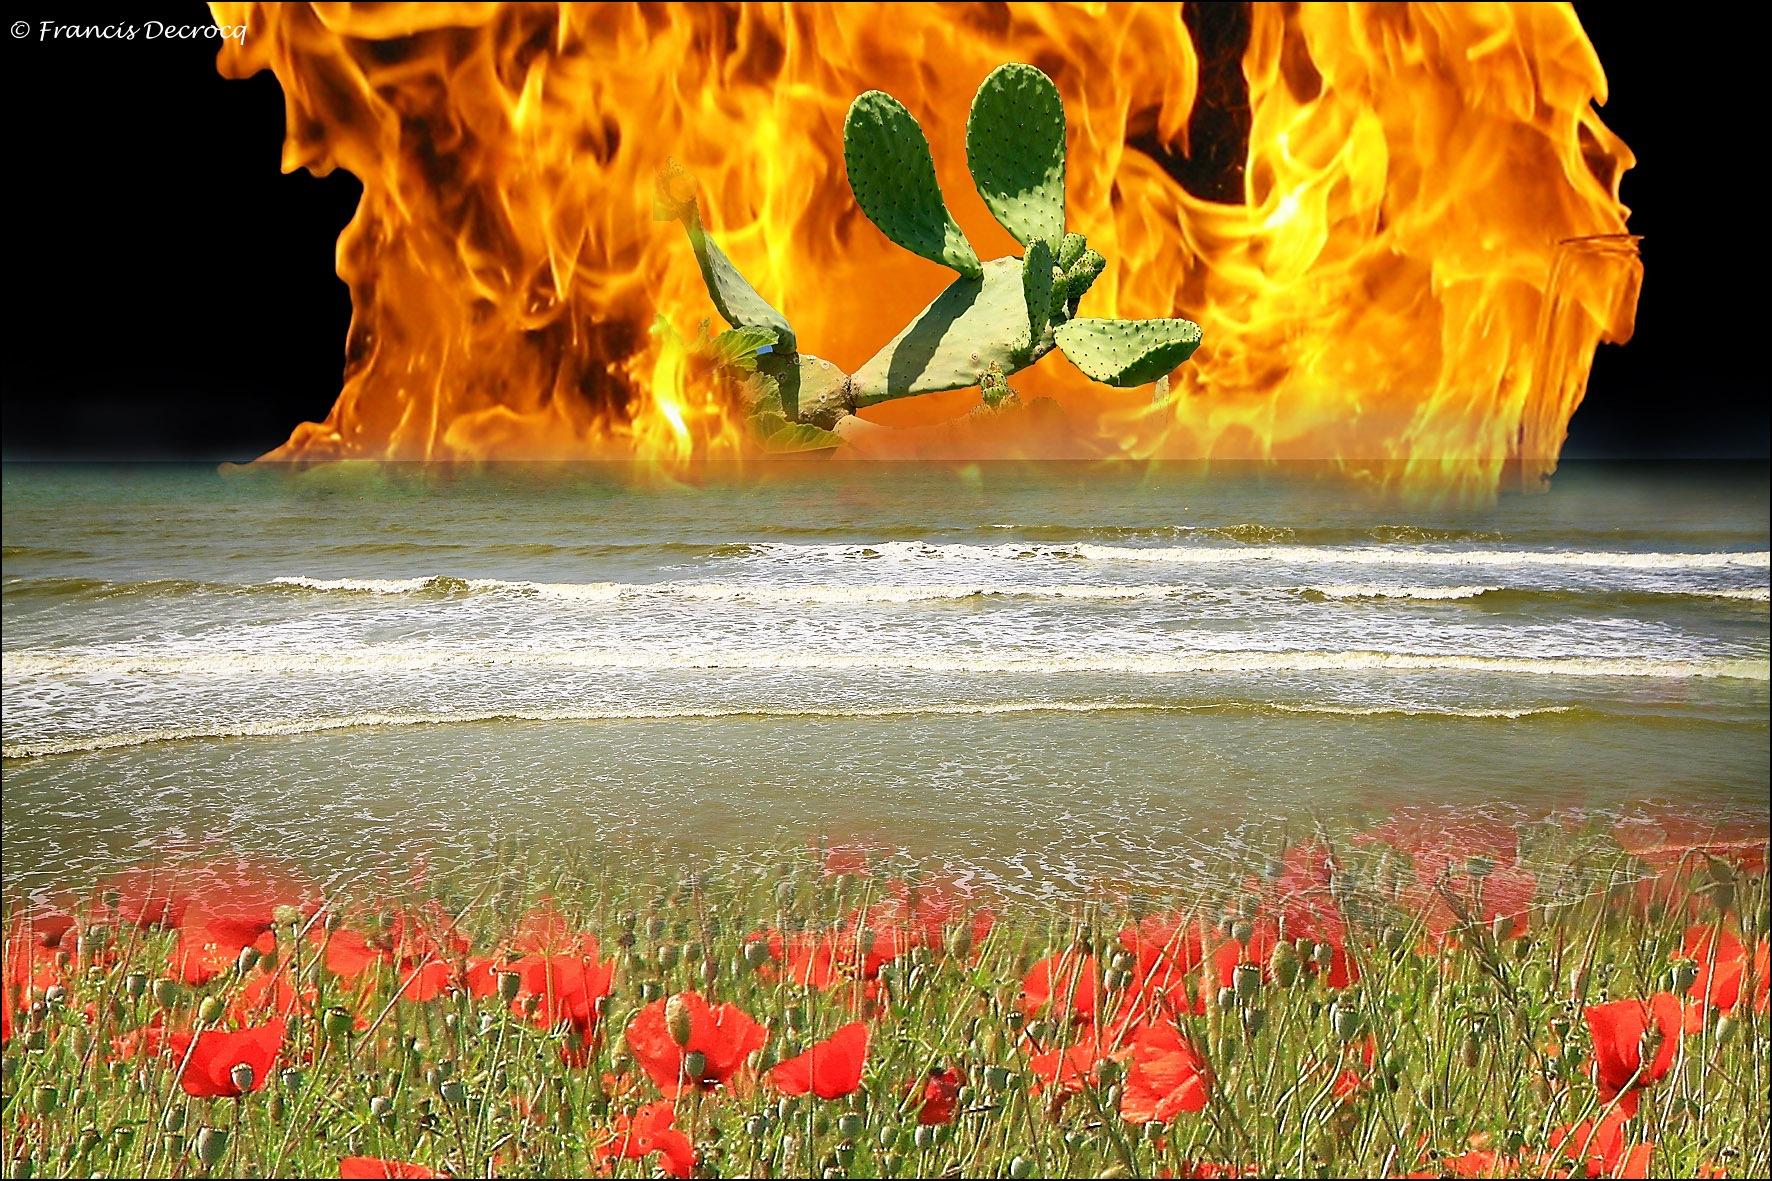 Vlammen by Francis Decrocq